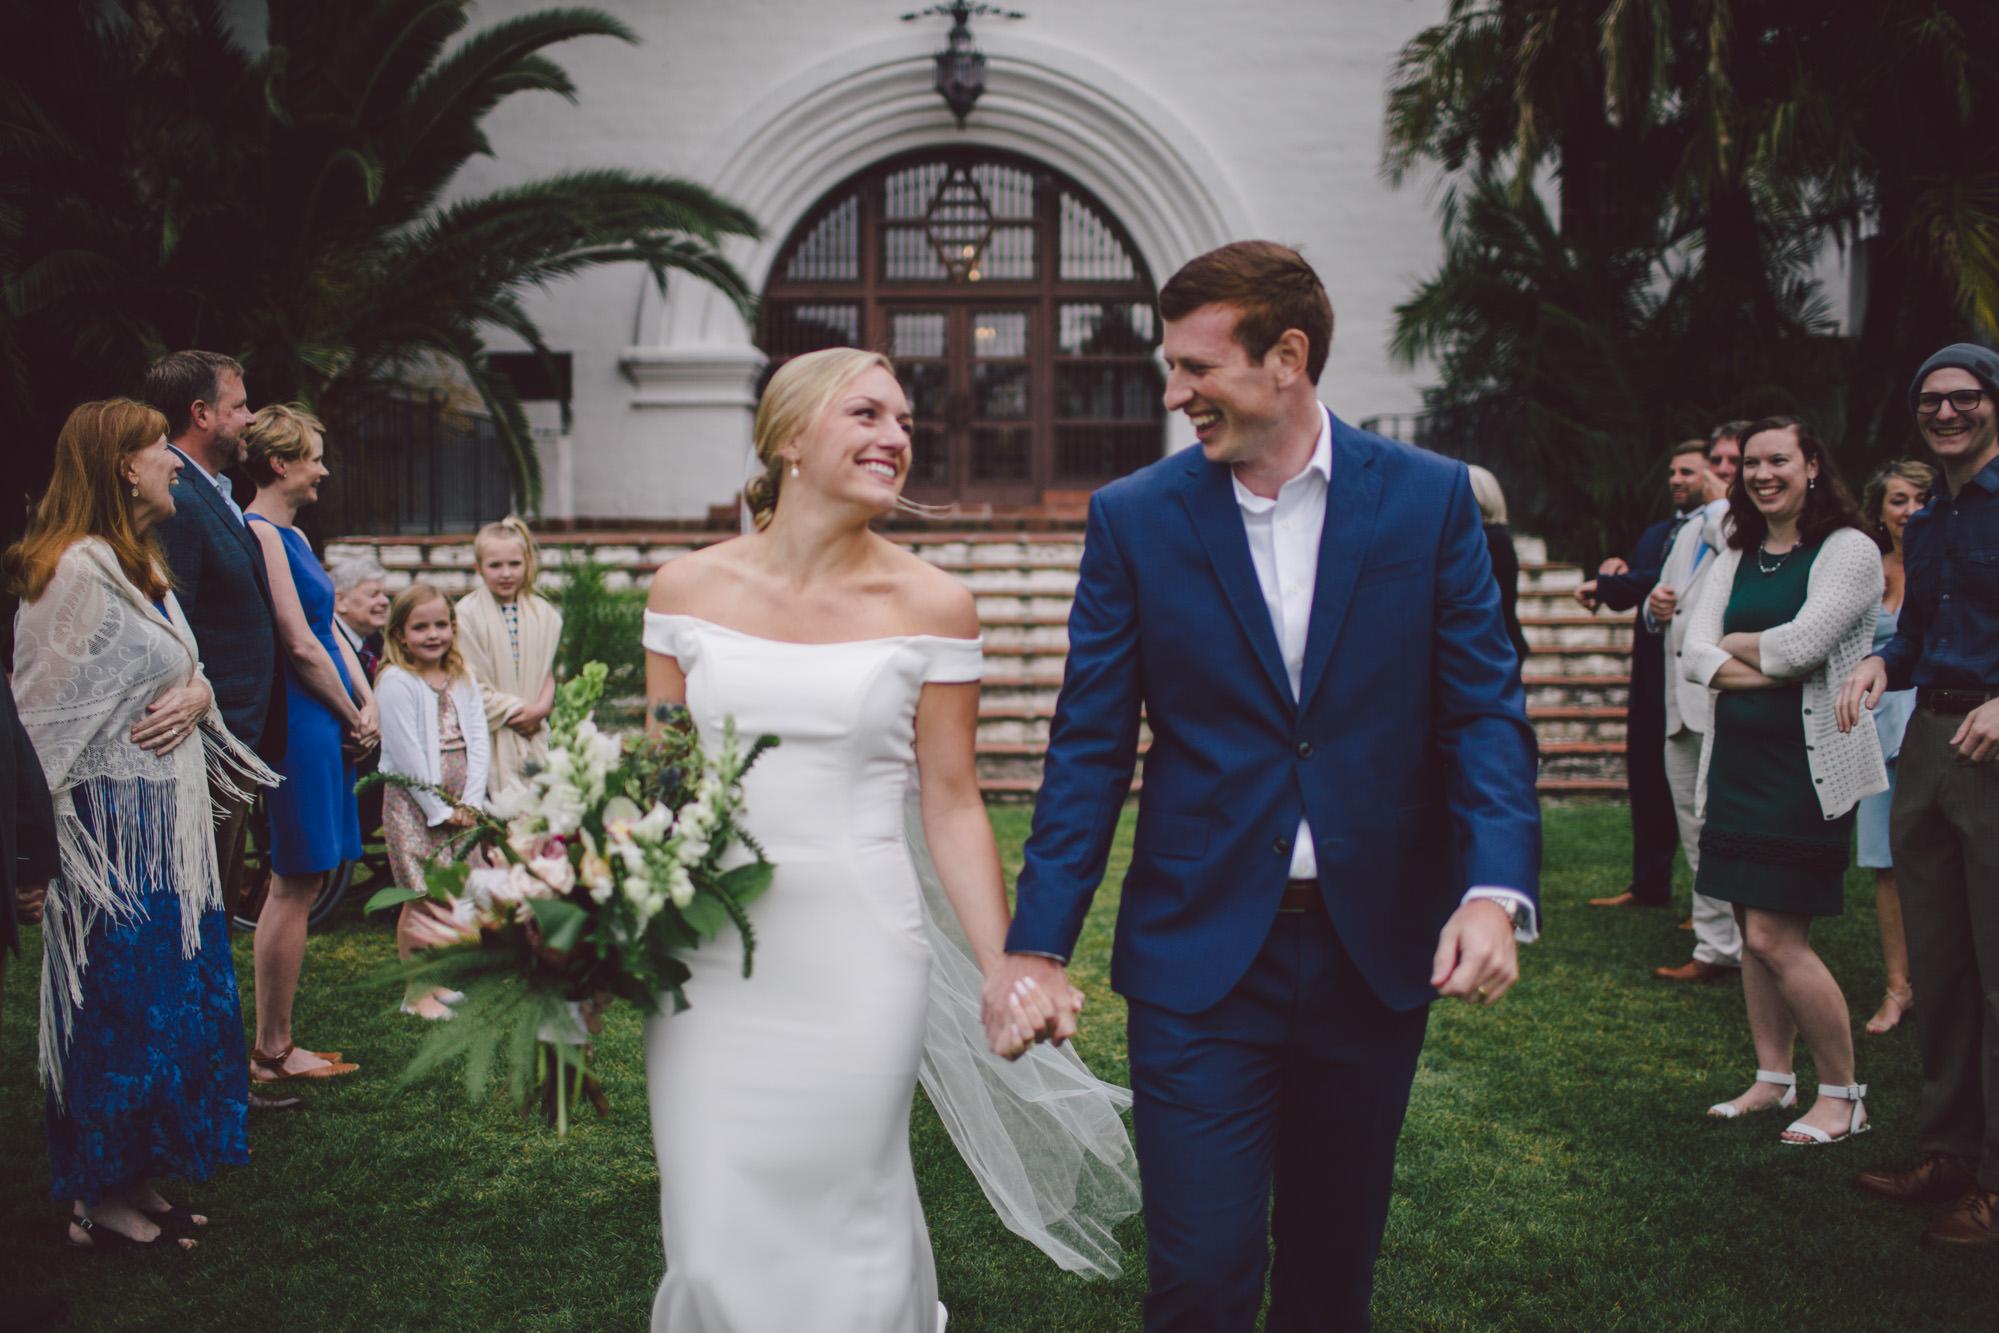 Katie +Paul - Santa Barbara courthouse elopement